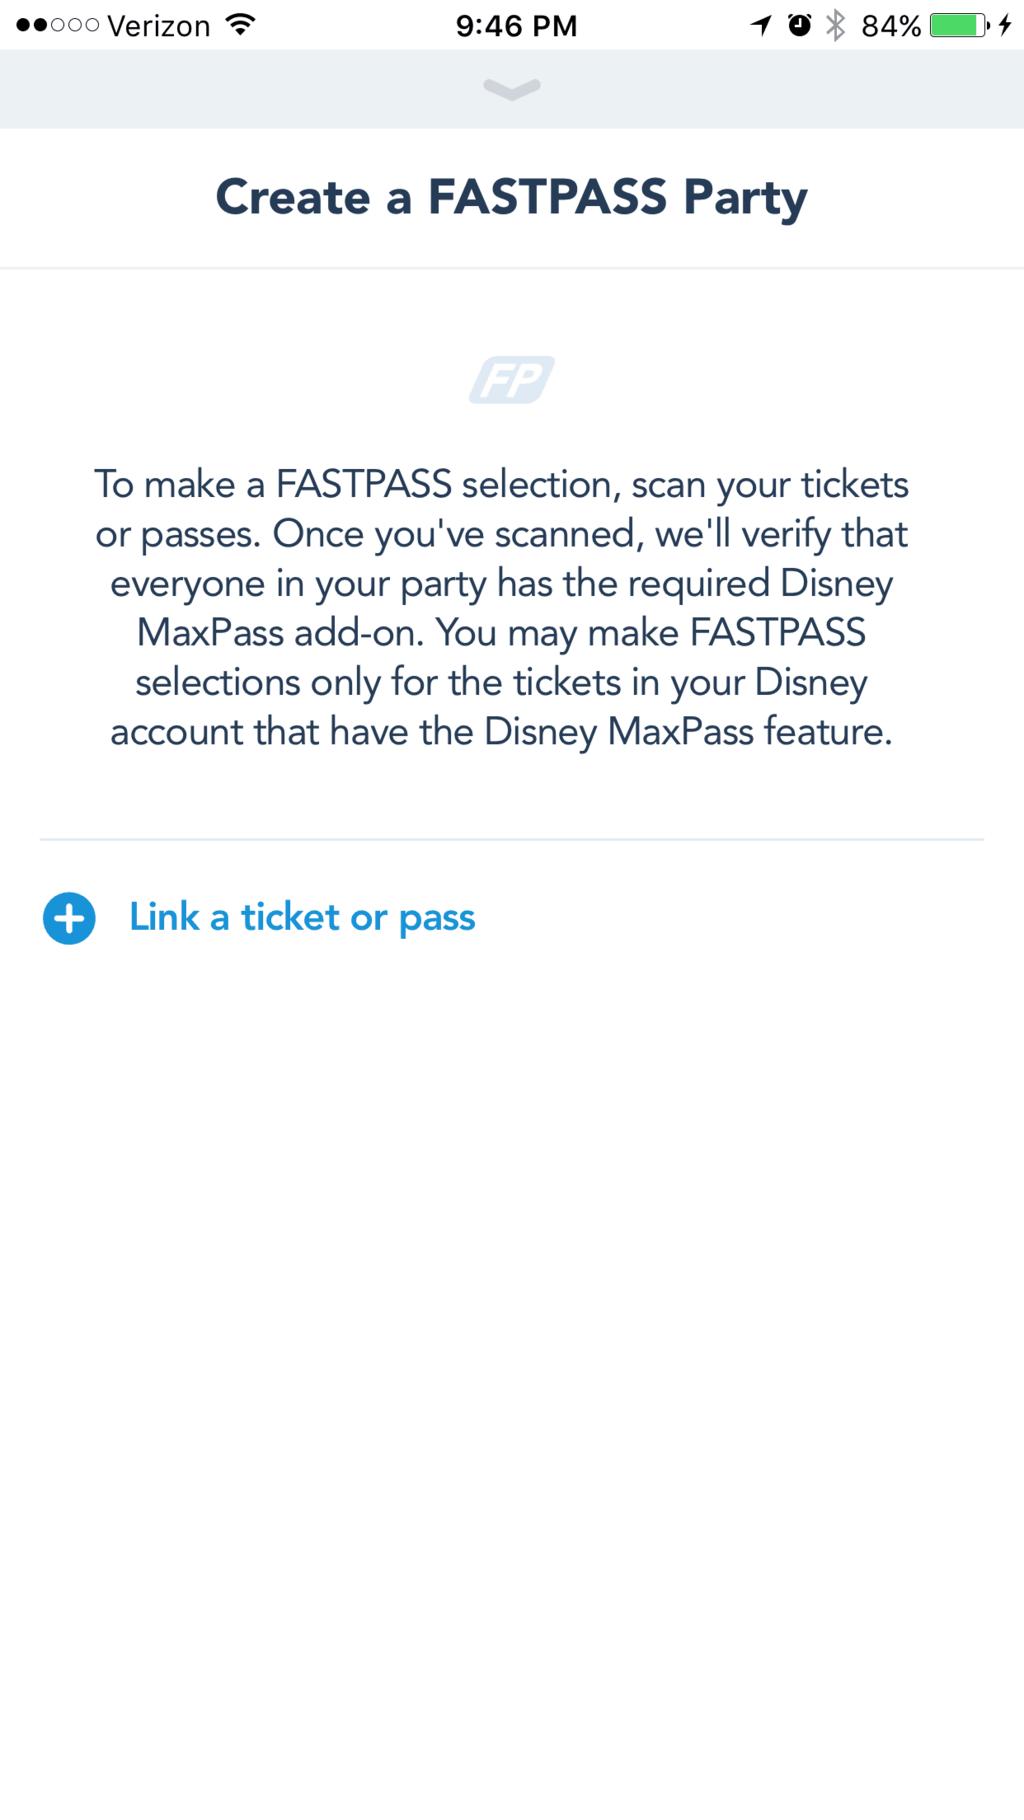 How to Use Disney MaxPass at Disneyland